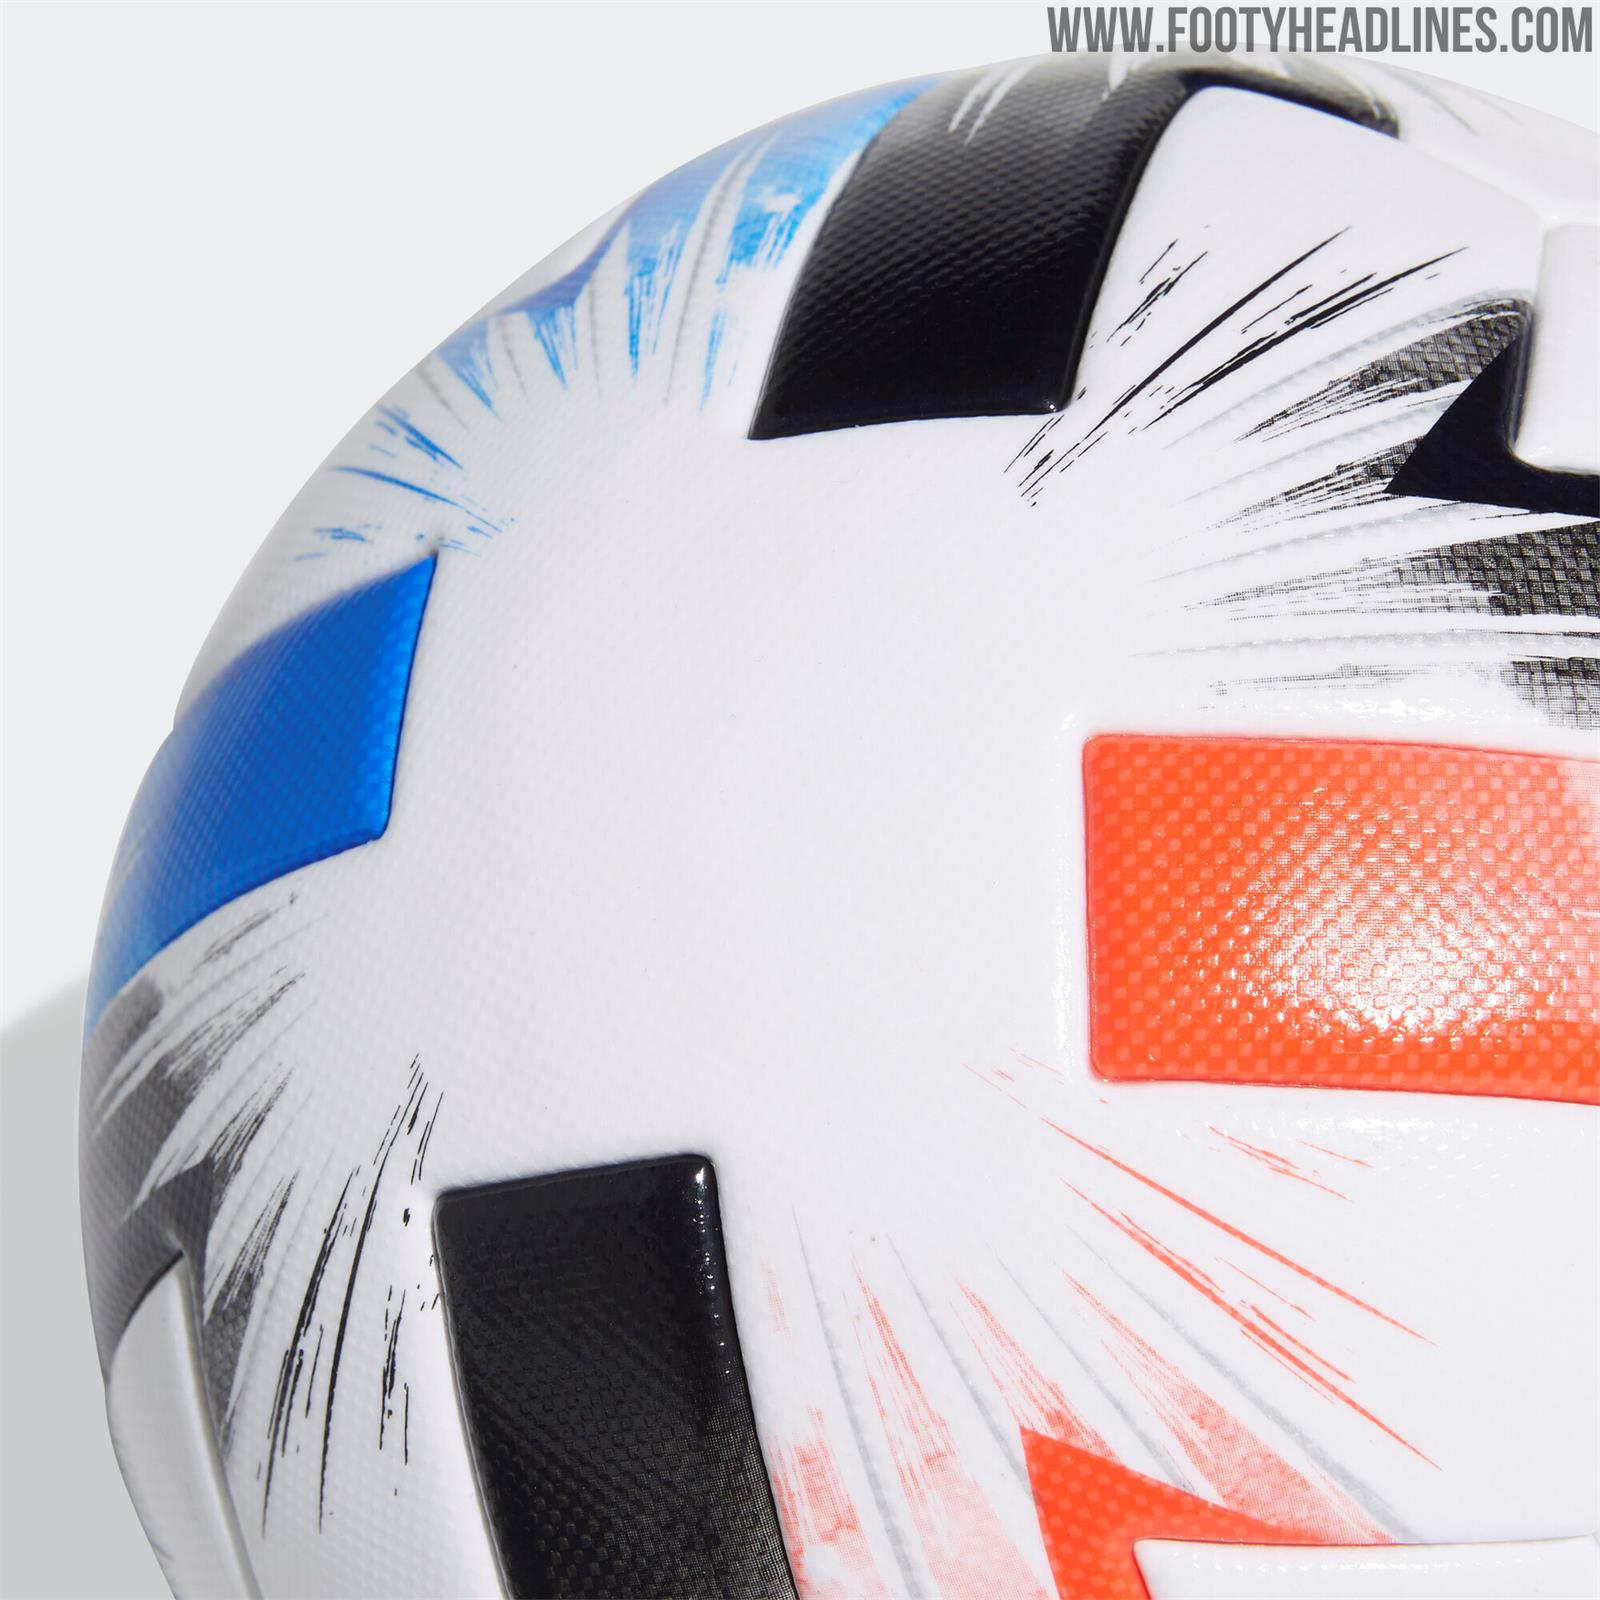 Tsubasa Fussball